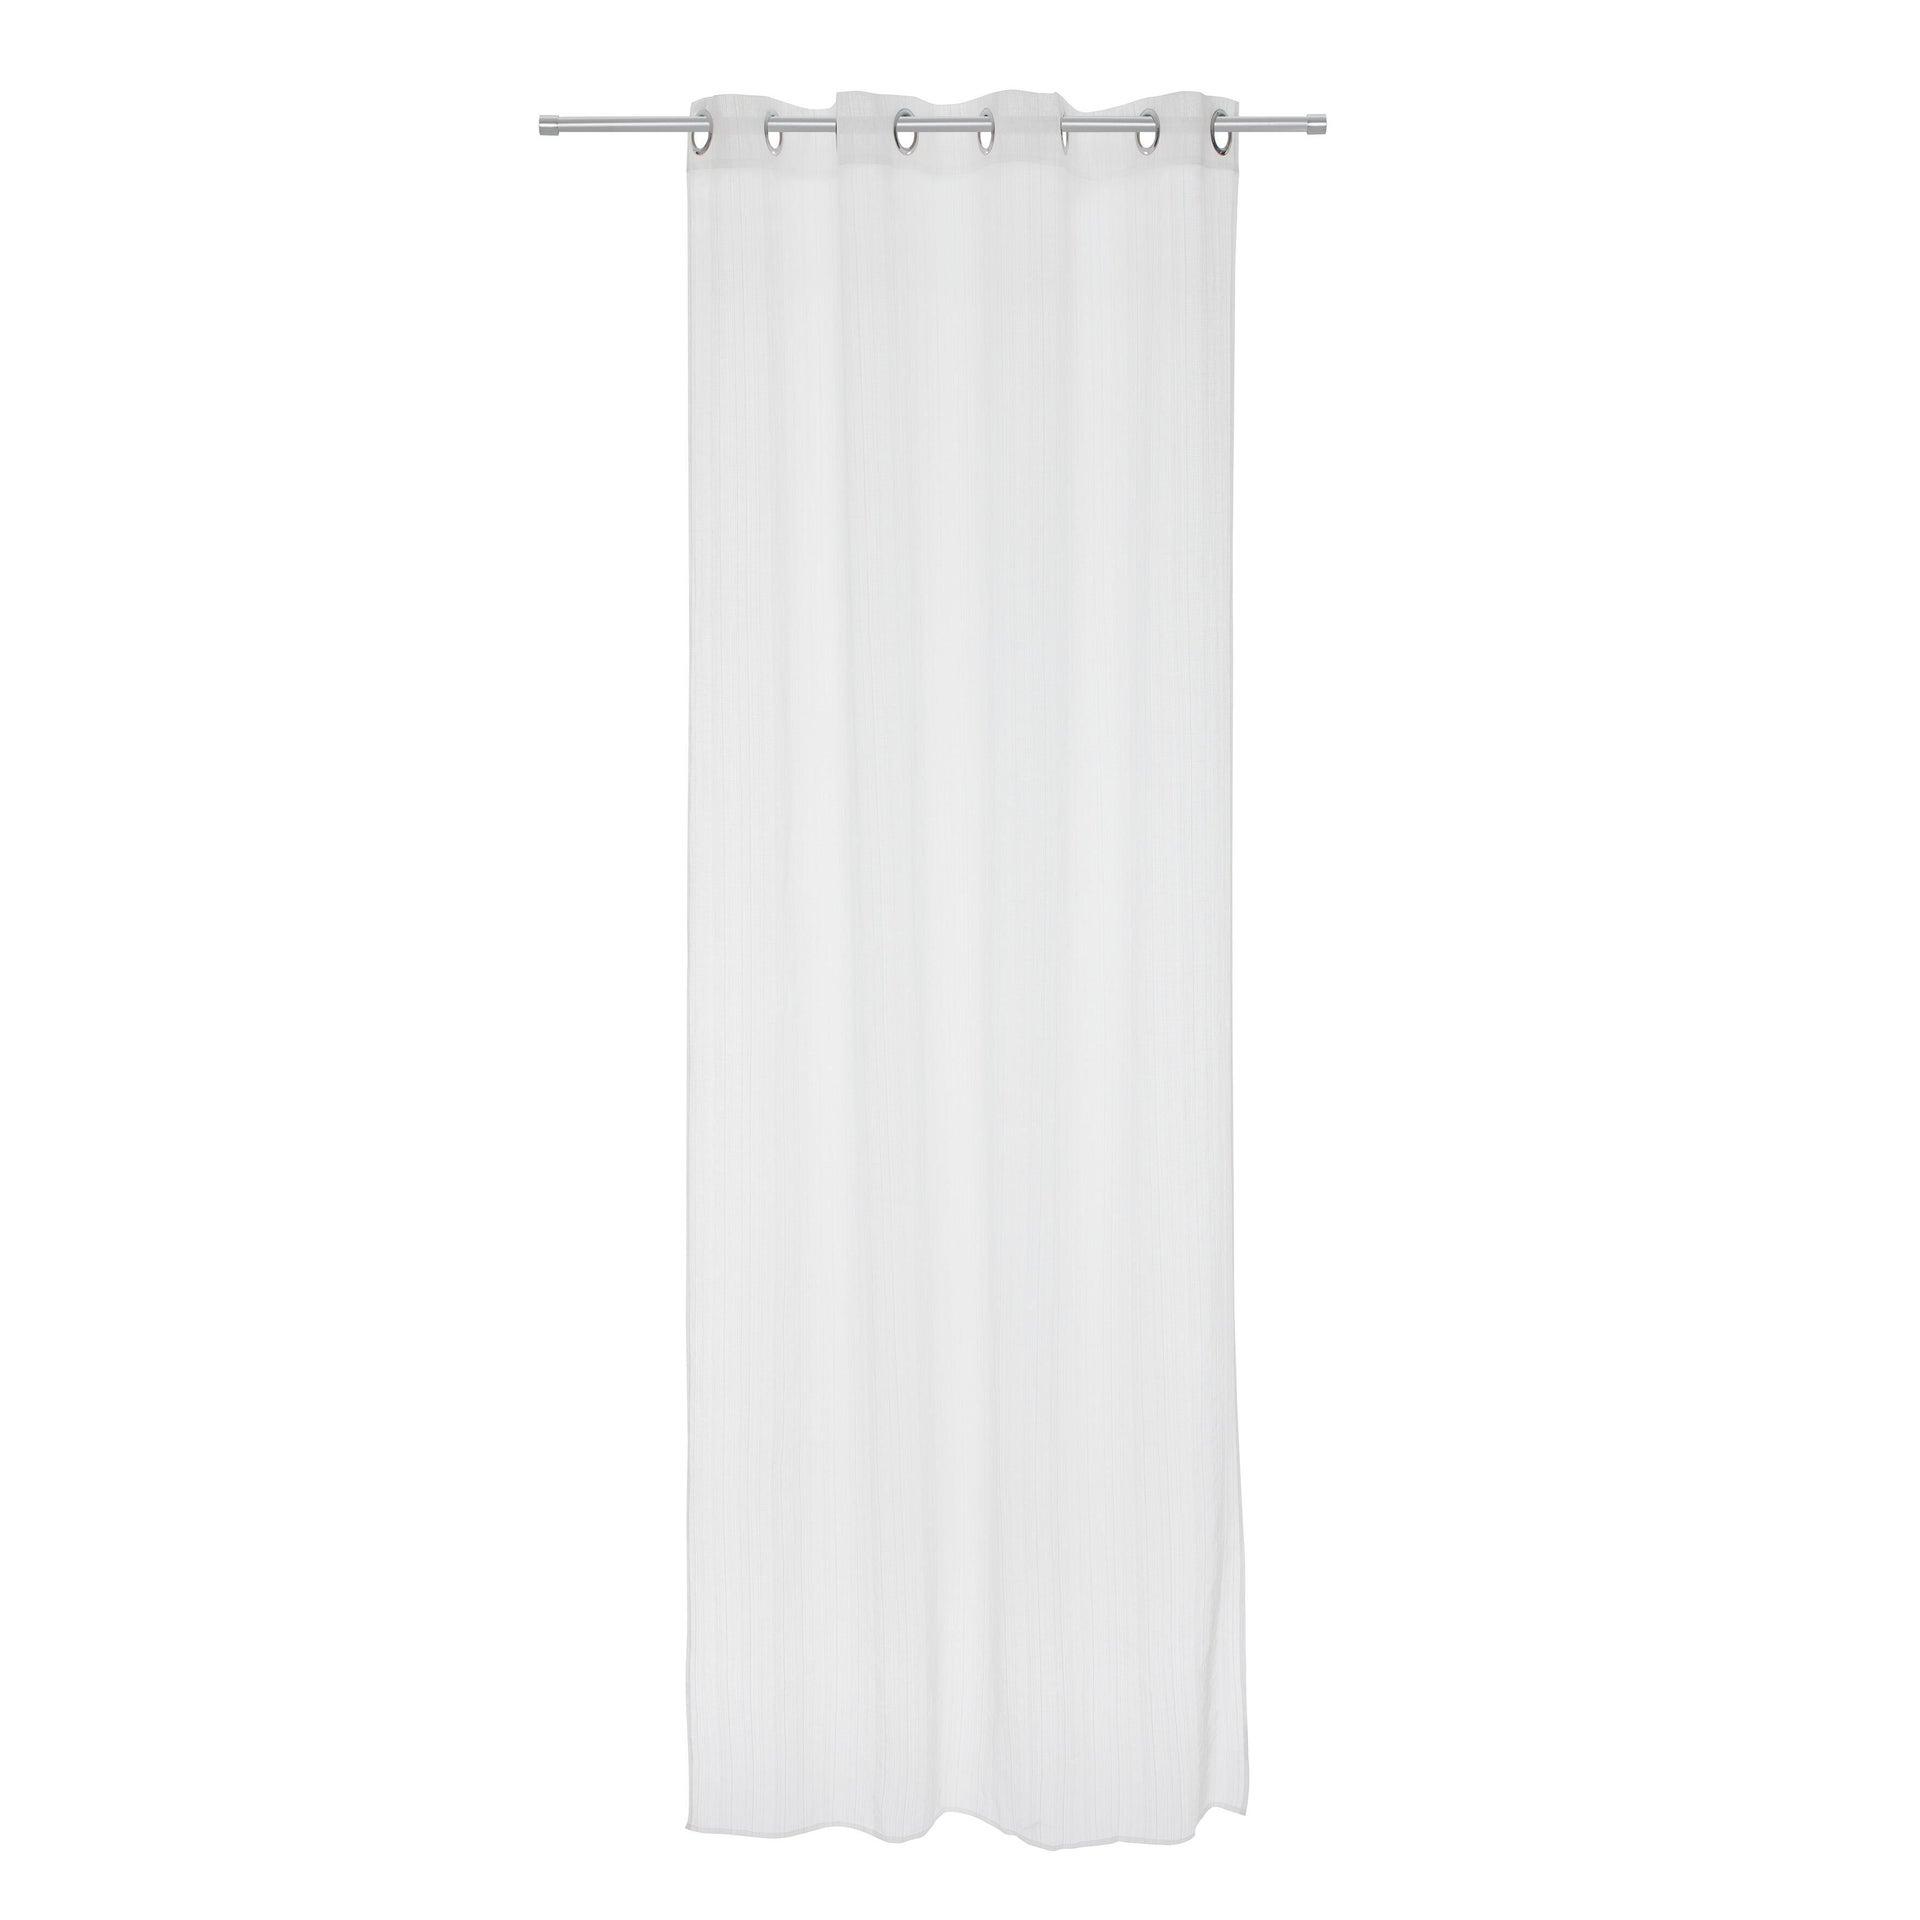 Tenda INSPIRE Lolita bianco occhielli 140 x 280 cm - 4